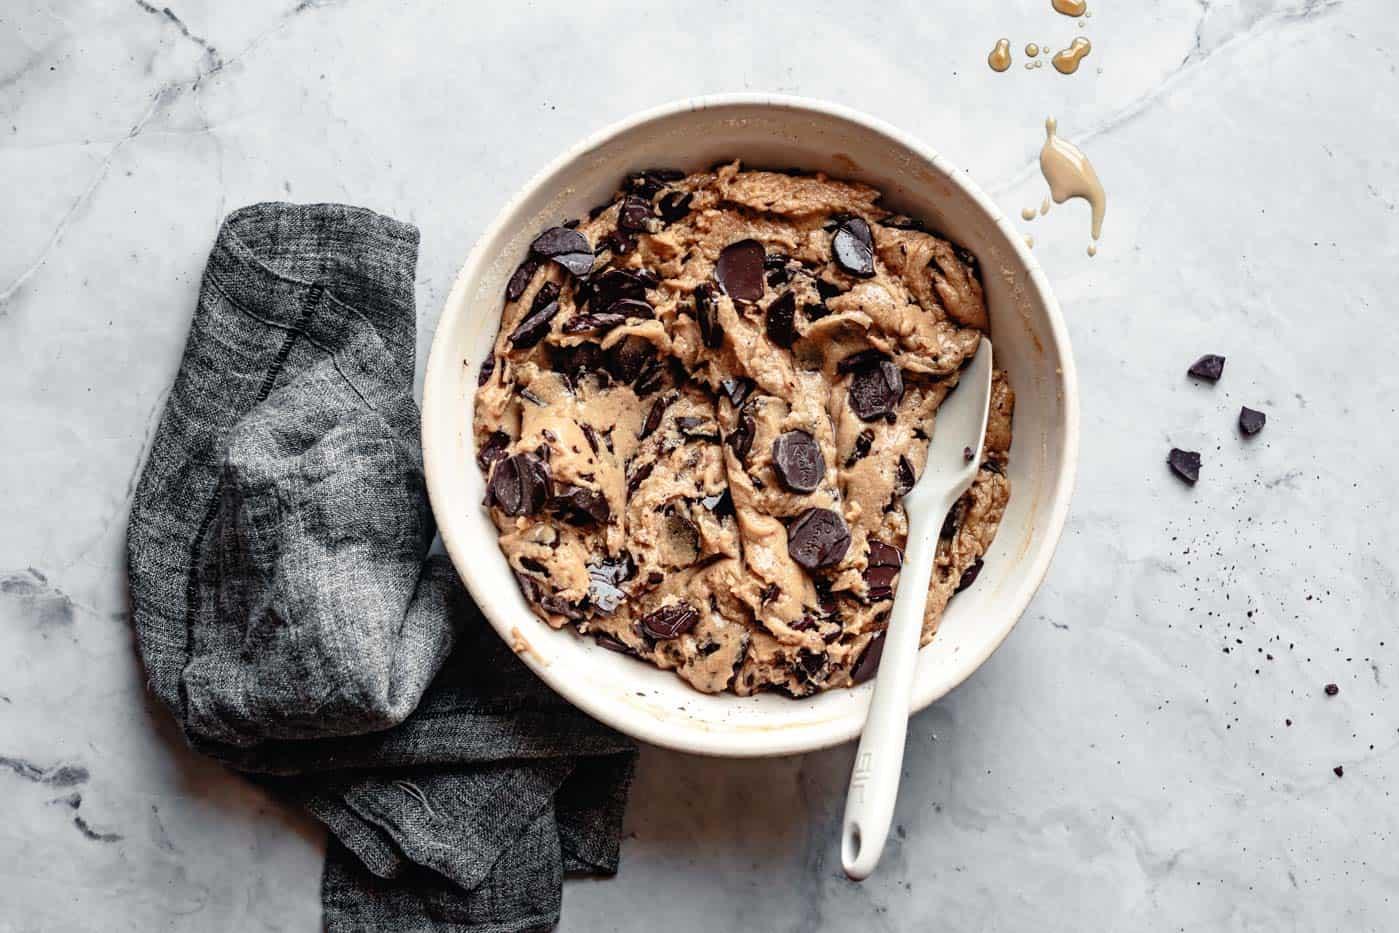 chocolate tahini cookie dough in a bowl